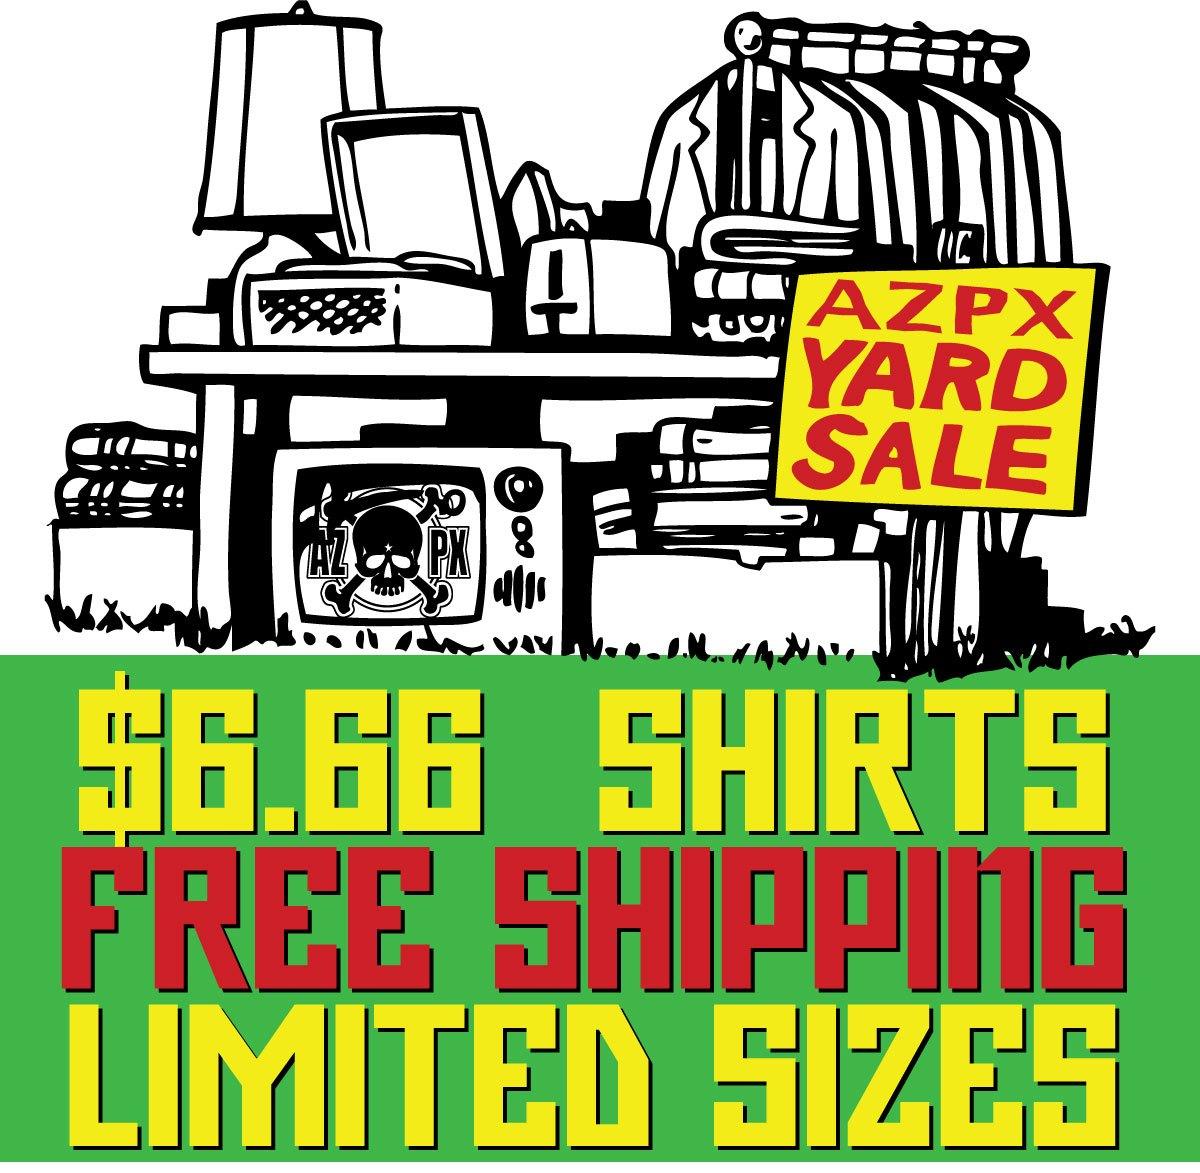 1200x1173 Azpx Yard Sale Azpx Skateboards